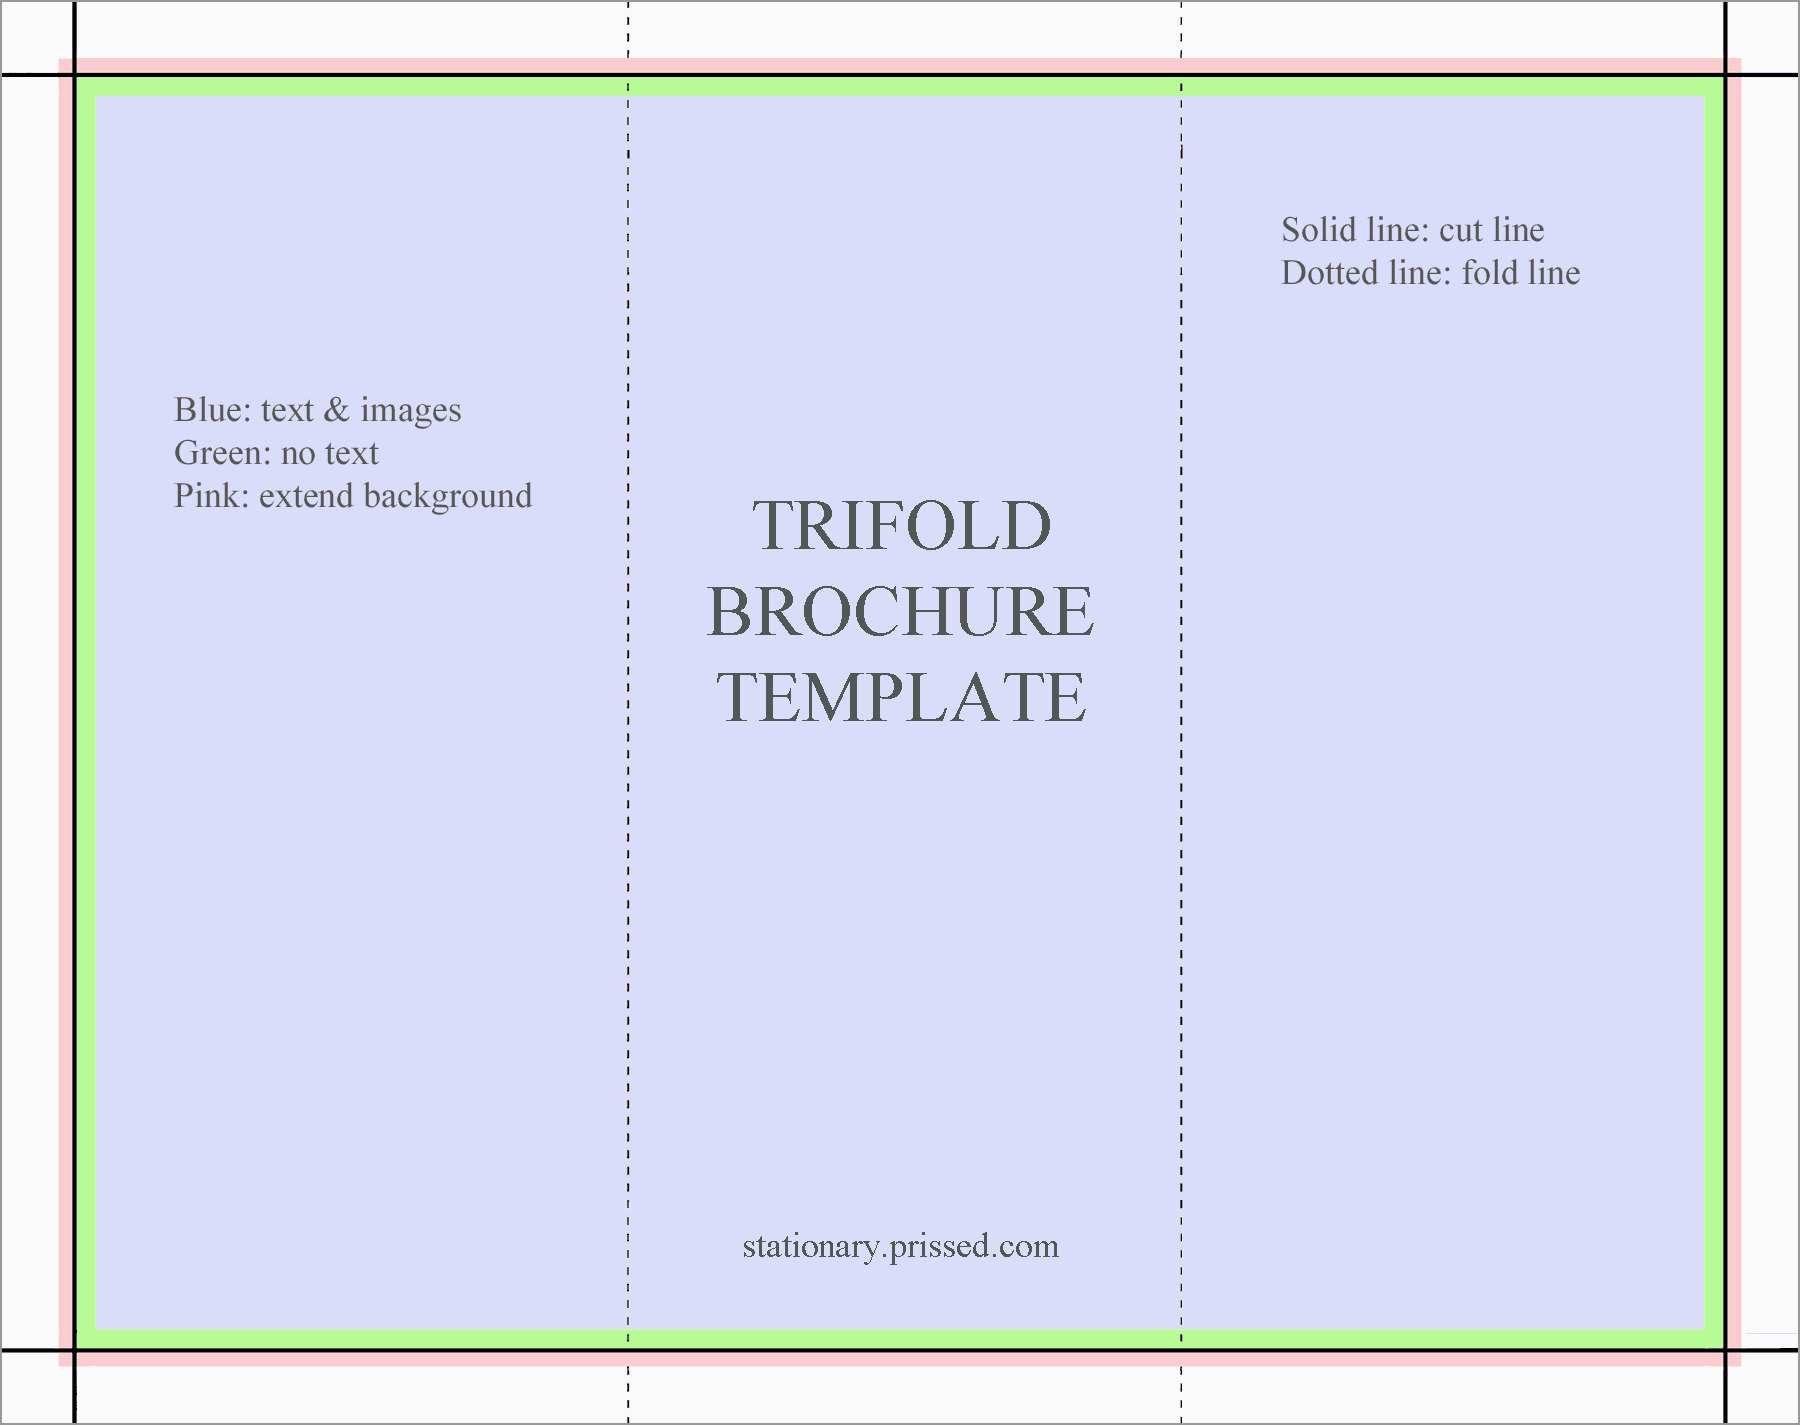 Inspirational Free Tri Fold Brochure Template Google Docs  Best Of Inside Science Brochure Template Google Docs